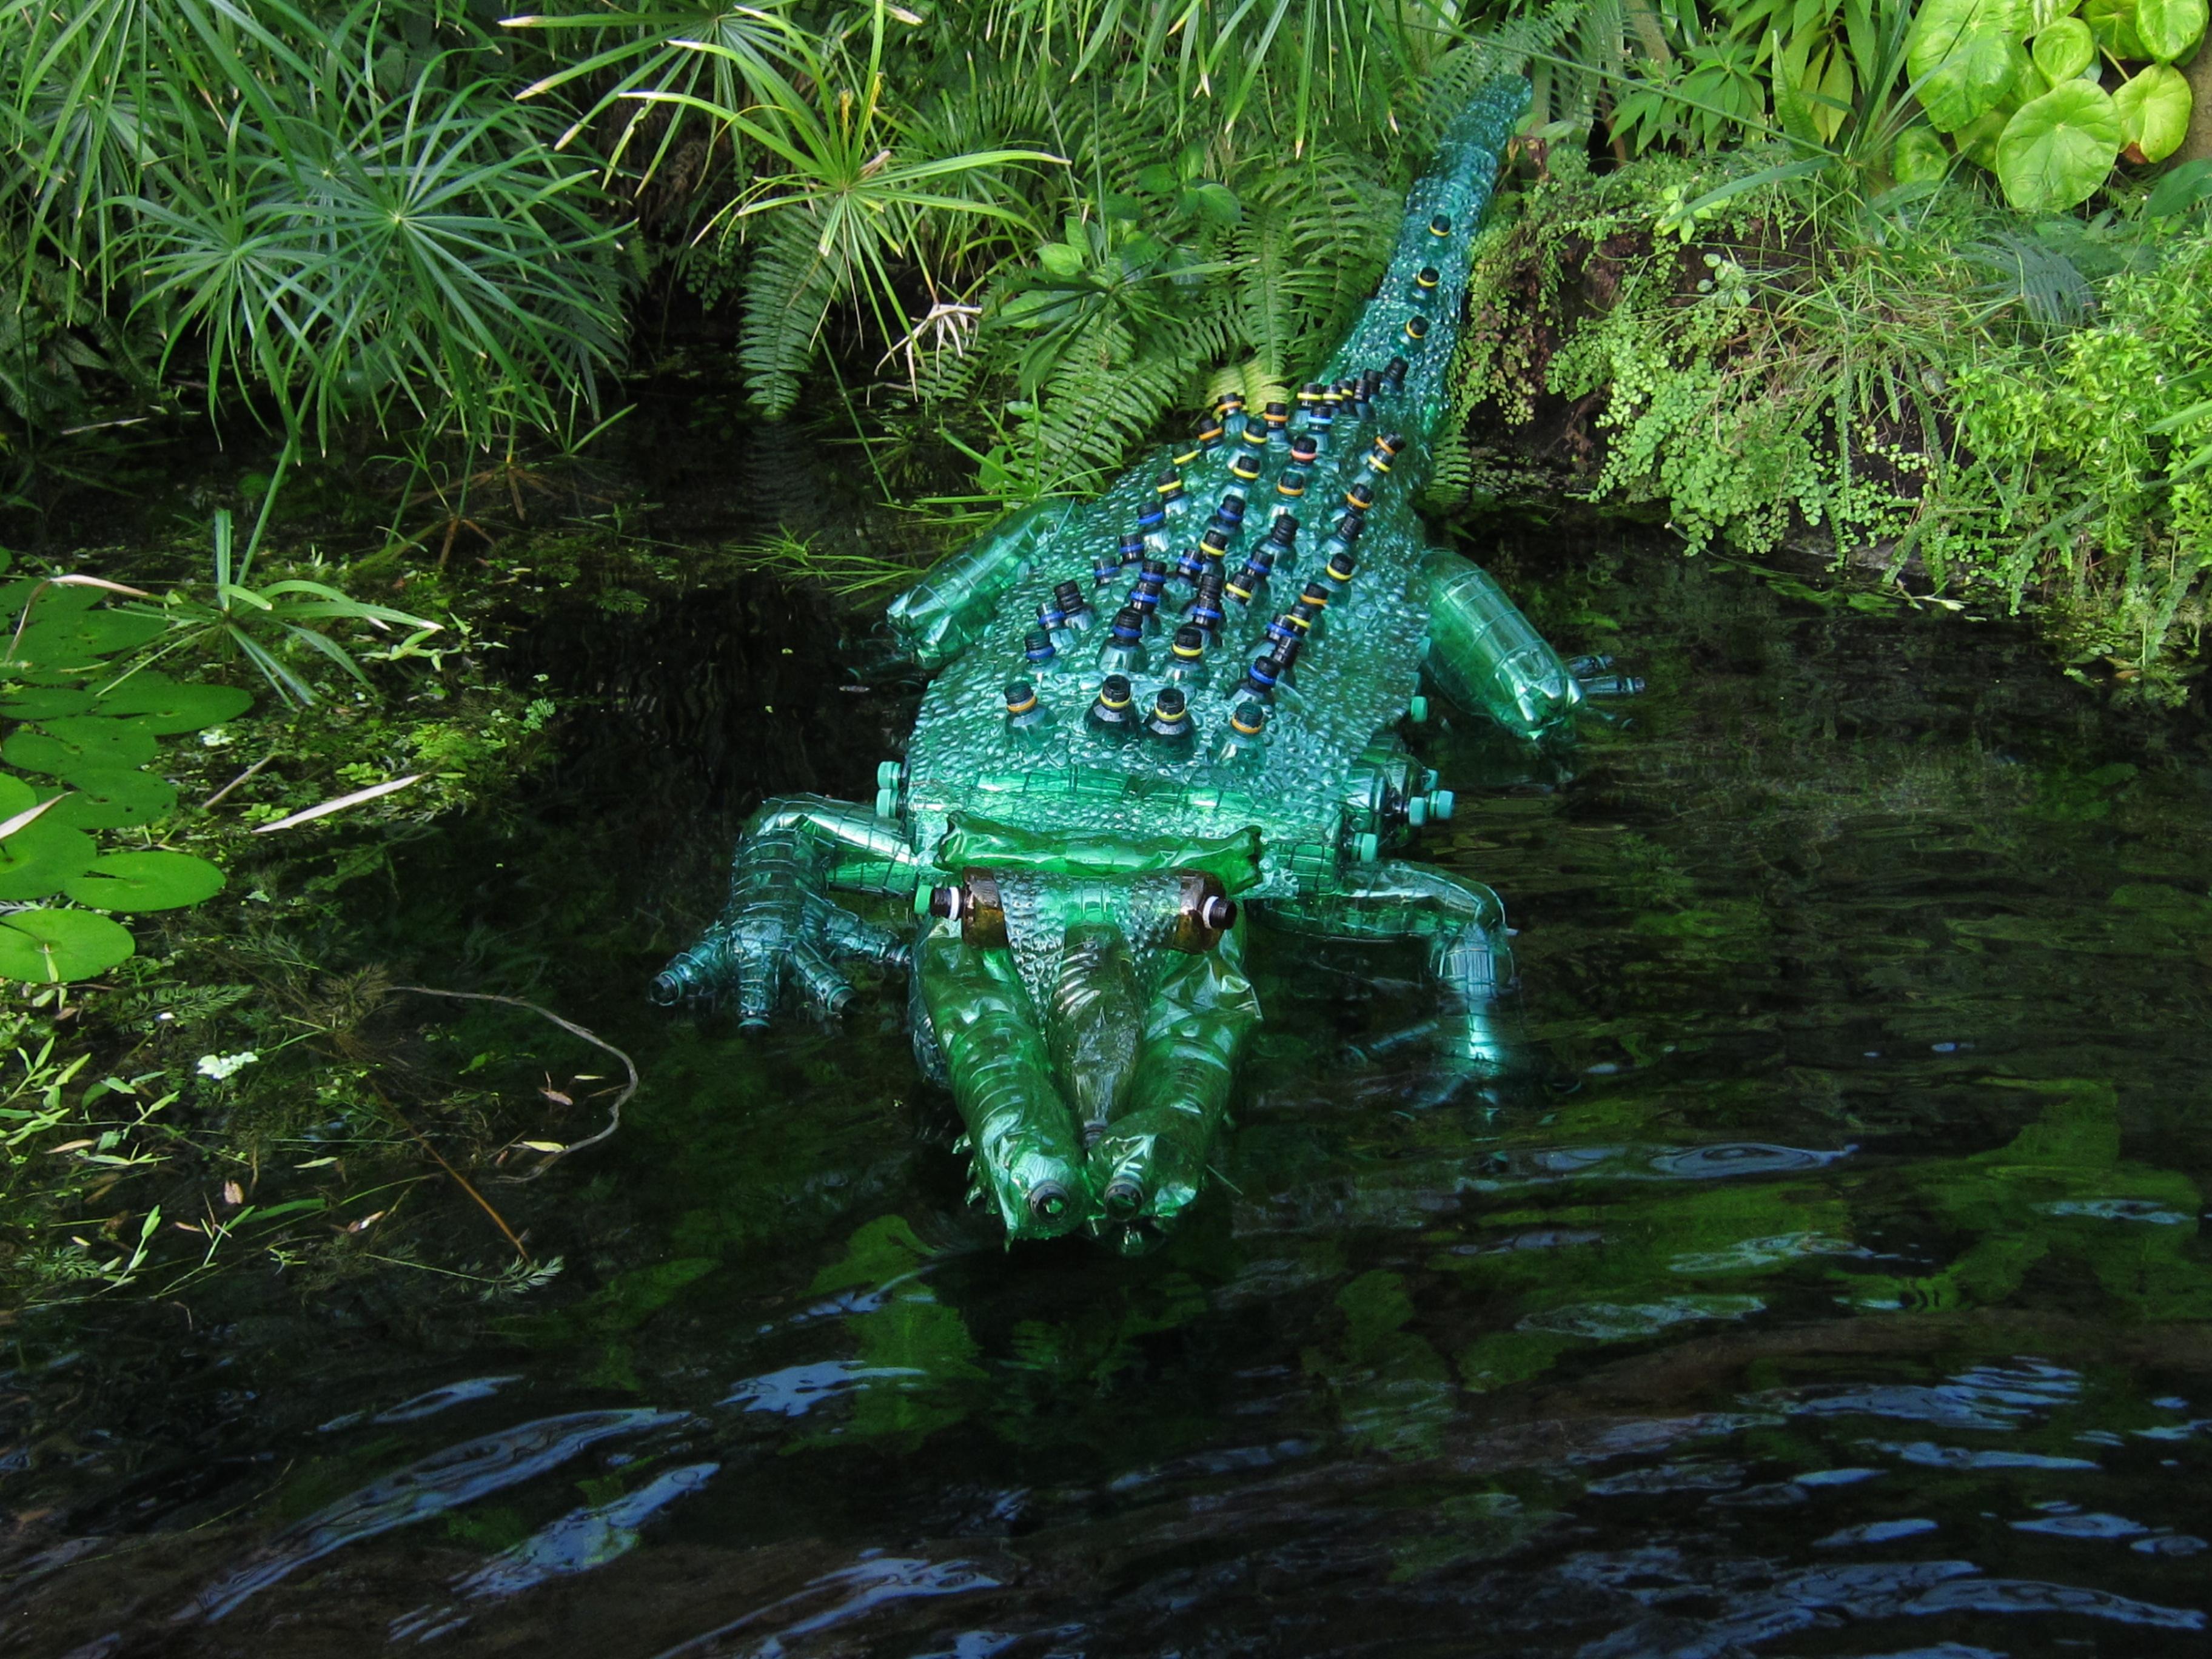 Coccodrillo in bottiglie di plastica, pet-art di Veronika Richterová